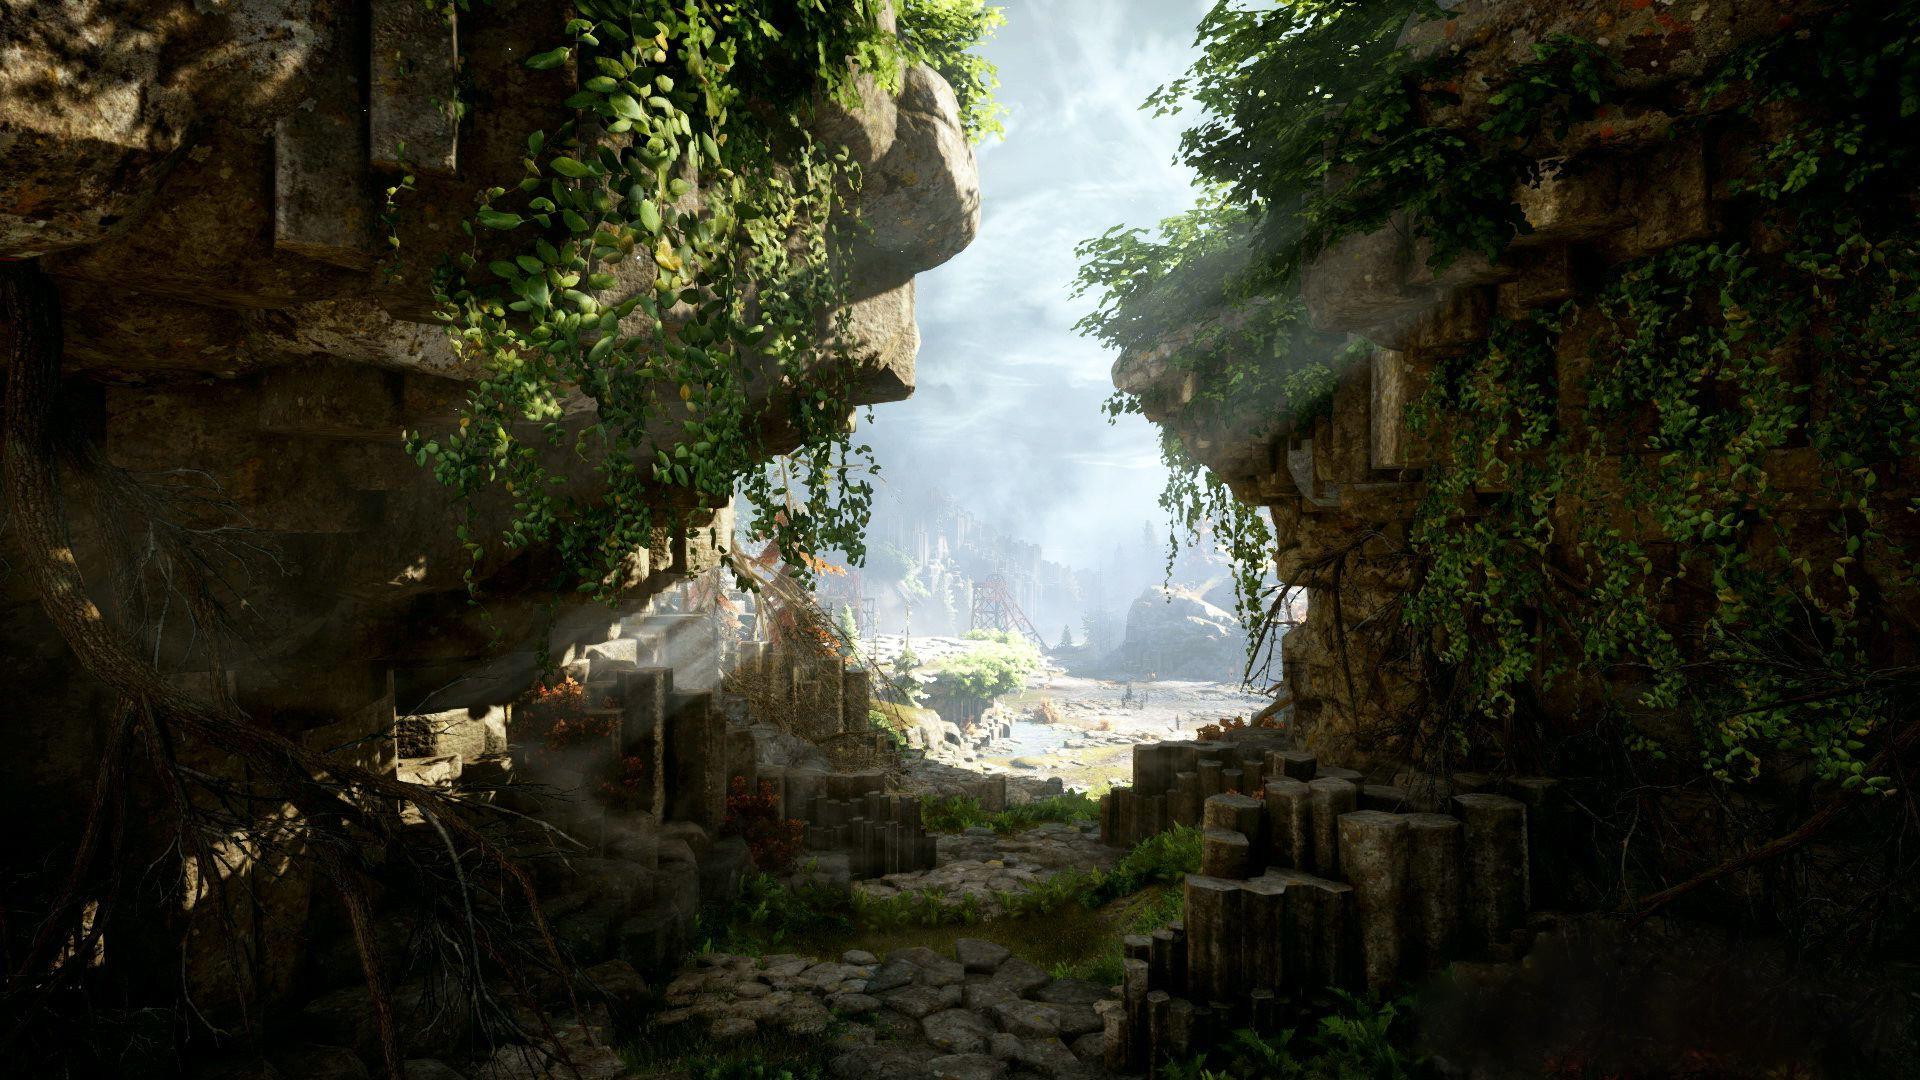 Jungle Waterfall Wallpaper Hd: Wallpaper : Forest, Waterfall, Video Games, Rock, Nature